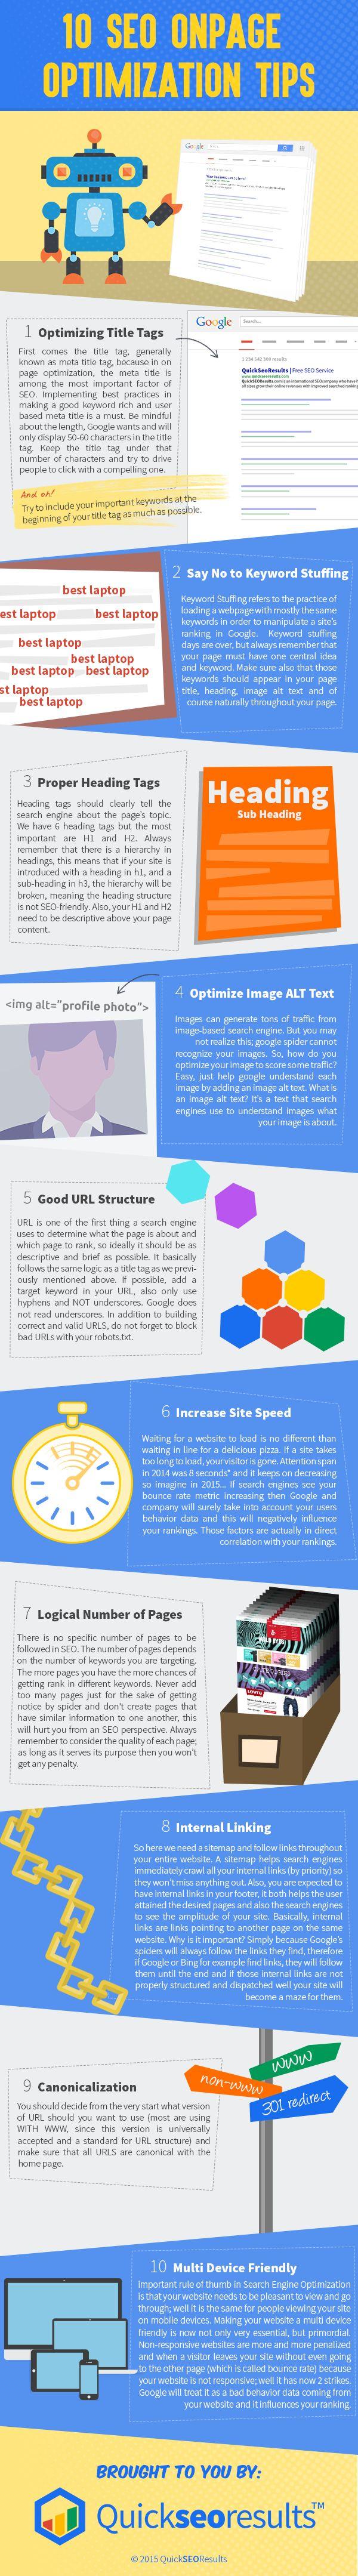 10-seo-onpage-optimization-tips-infographic